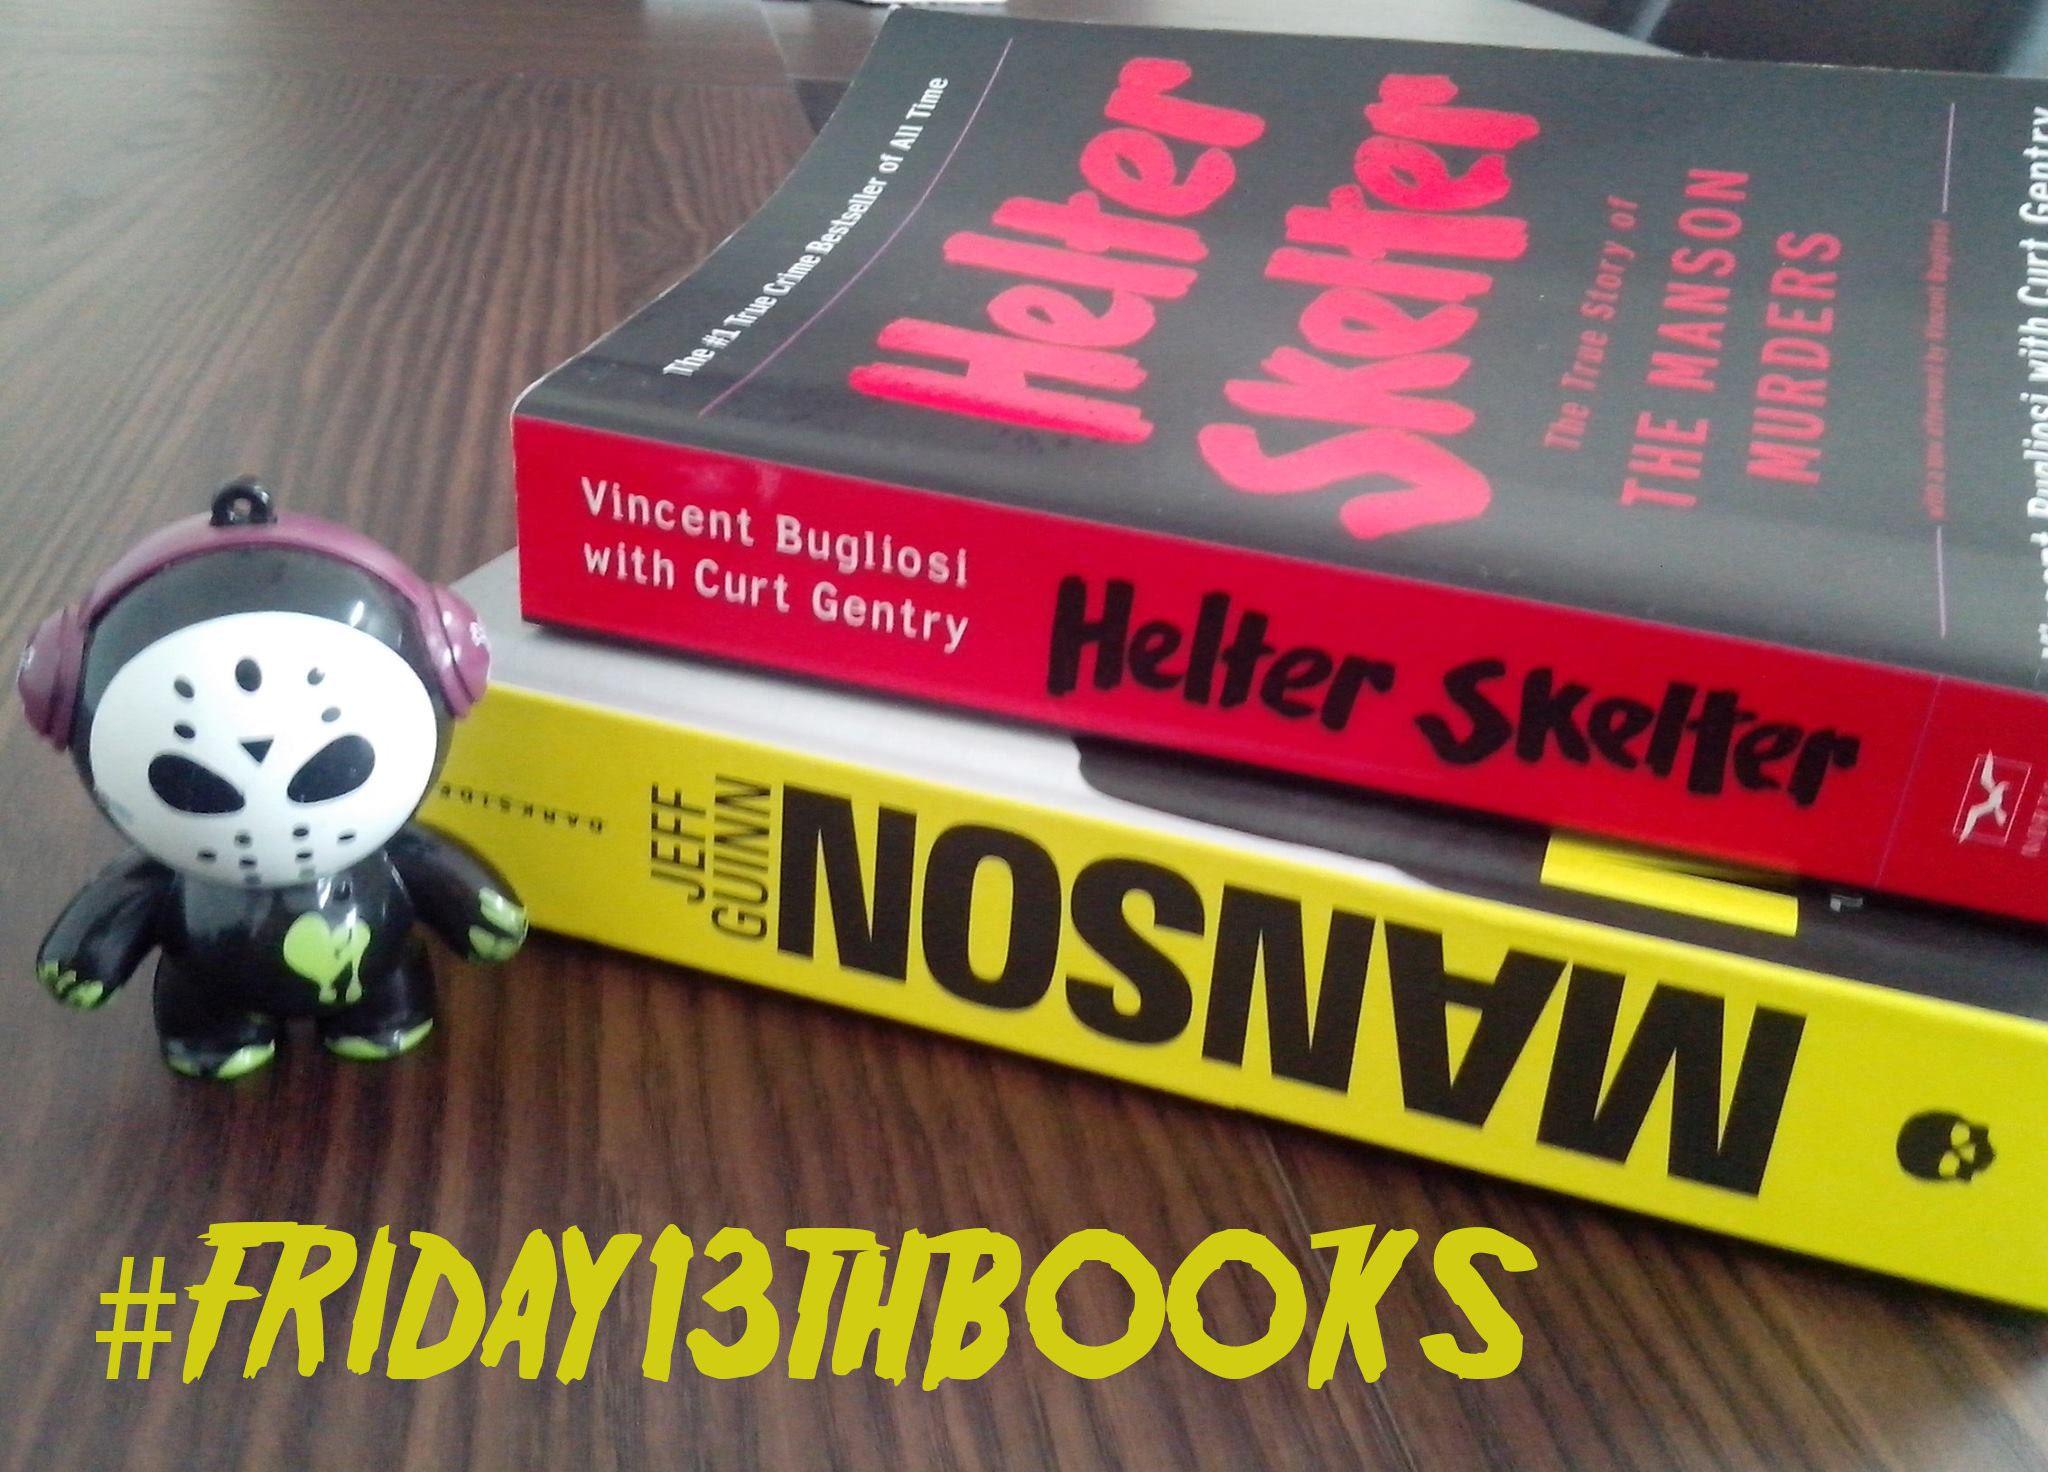 #FRIDAY13THBOOKS – HELTER SKELTER E MANSON - Resenha #helterskelter #vincentbugliosi #manson #jeffguinn #darksidebooks http://literalmentevivendo.com/friday13thbooks-helter-skelter-e-manson/